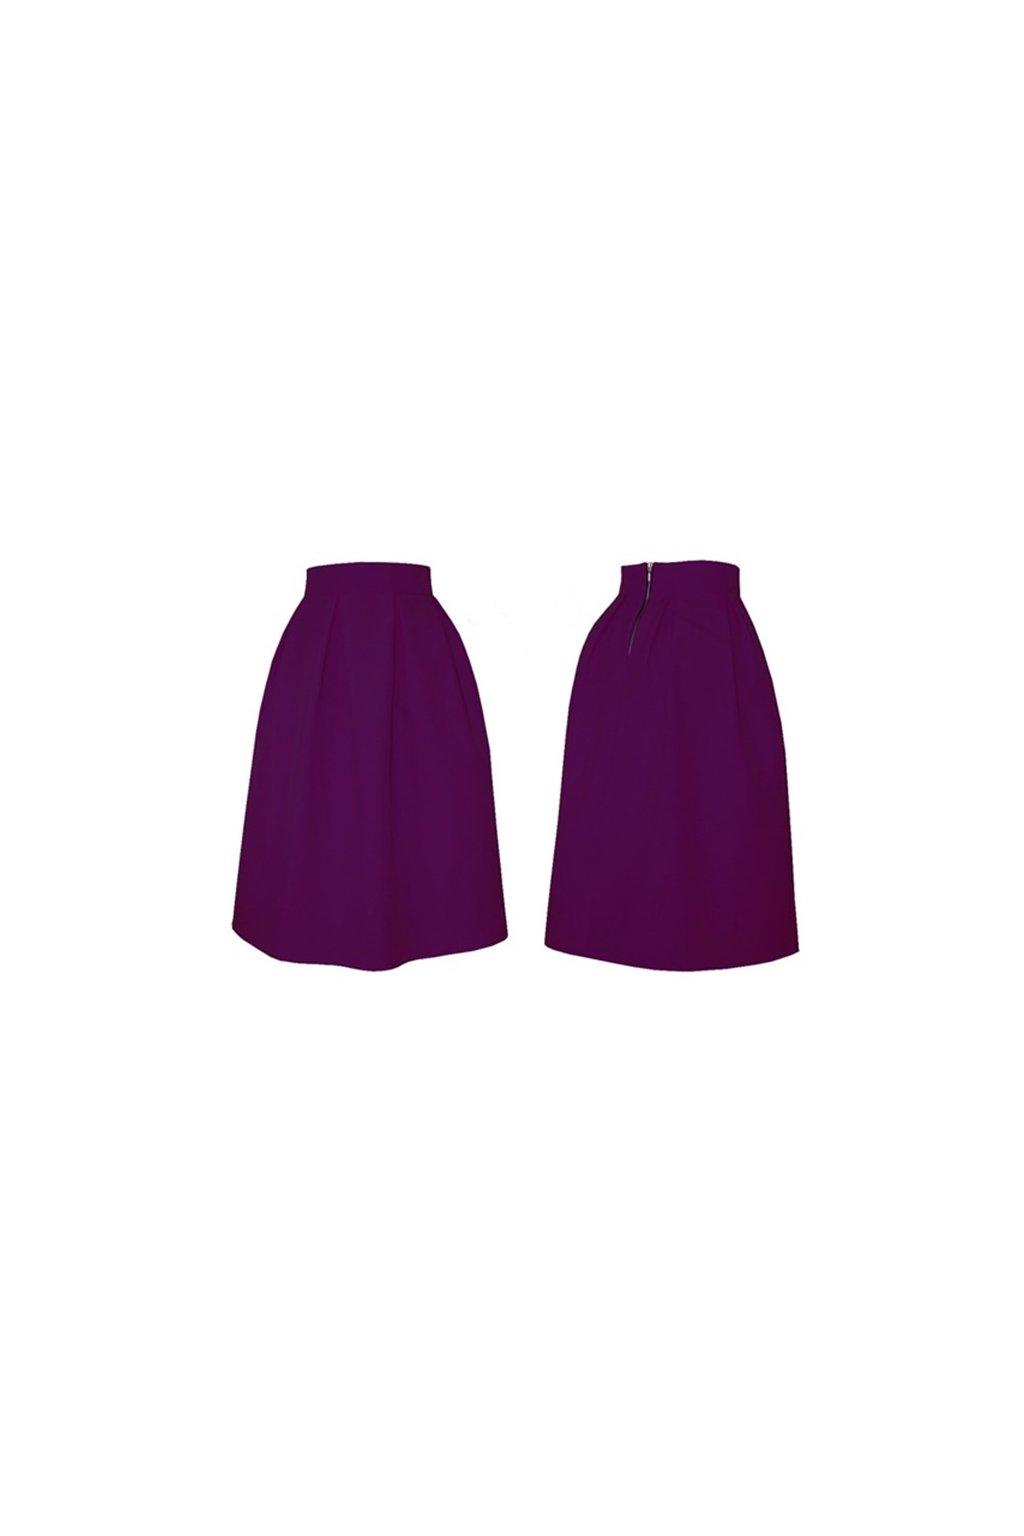 b02ddc46779e Áčková sukňa s protizáhybmi fialová - Tentation.sk